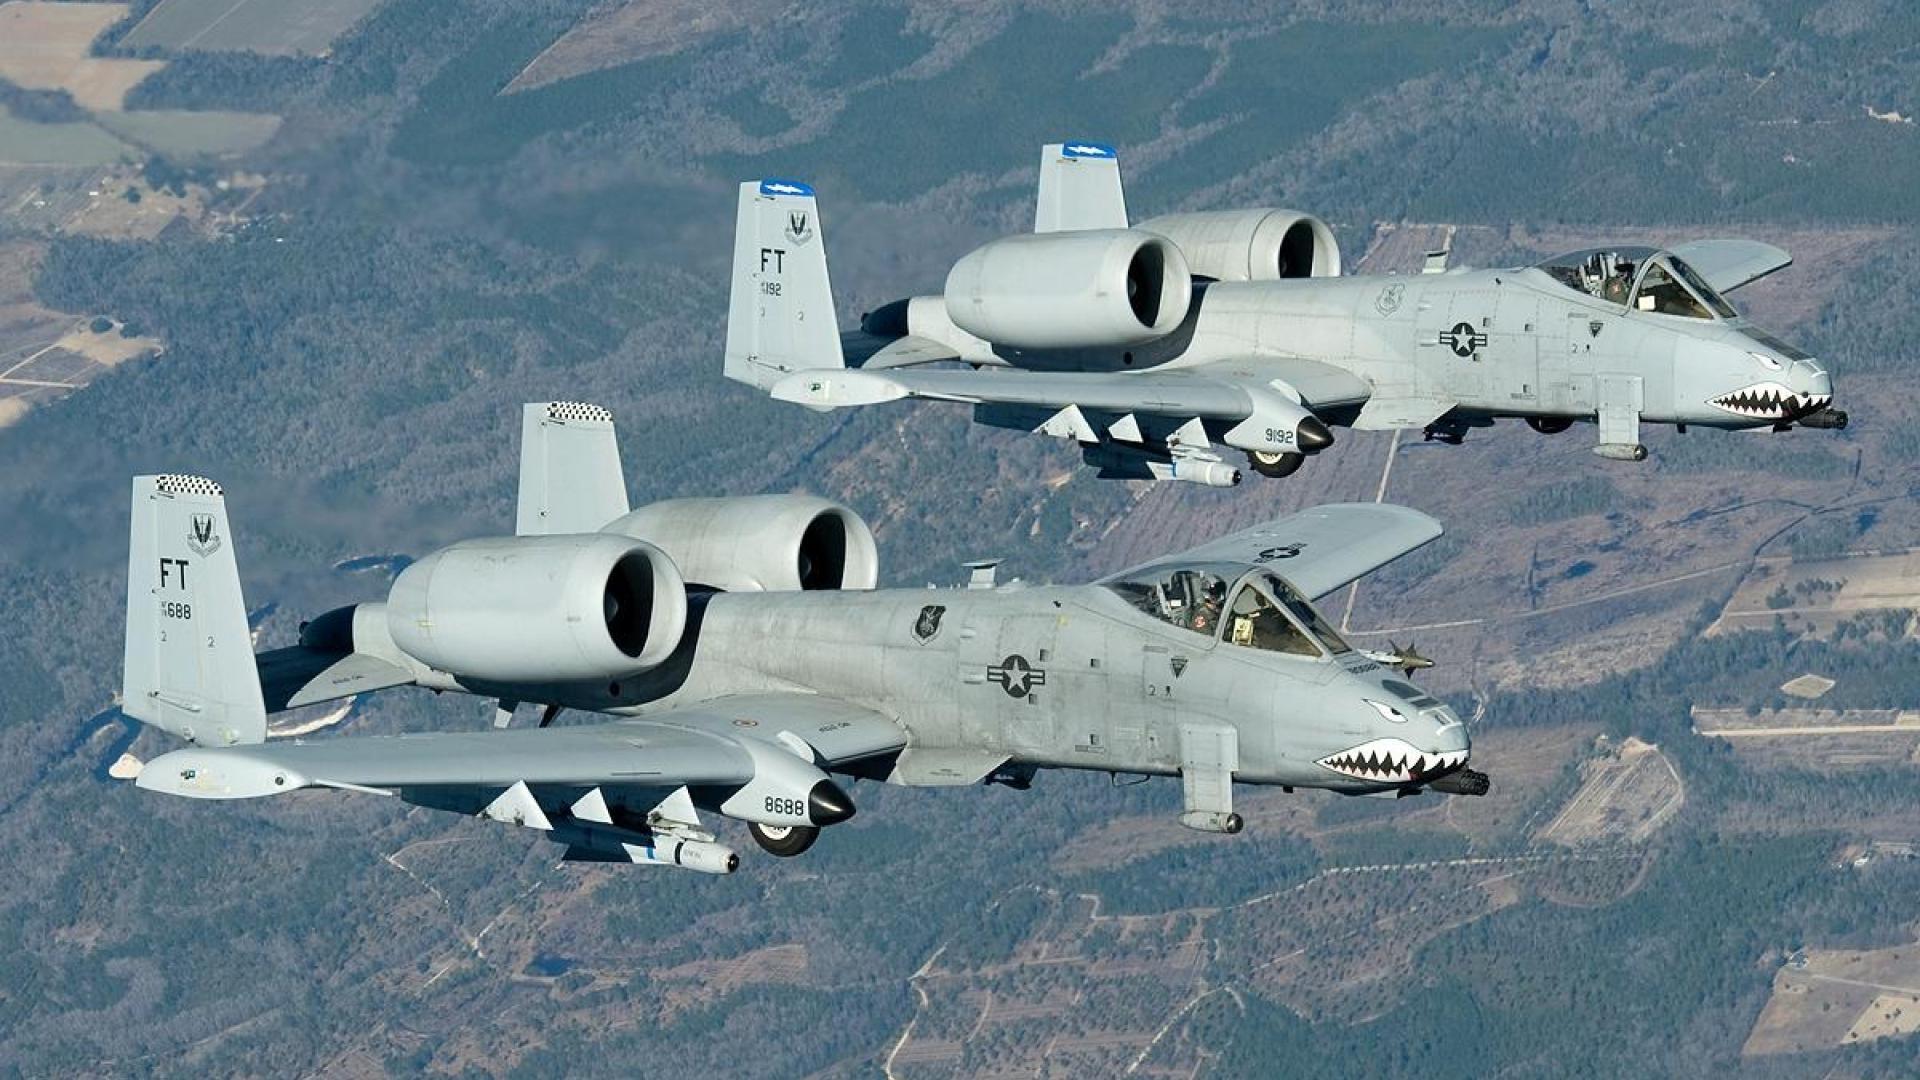 Images Of Fairchild Republic A-10 Thunderbolt II. Widescreen Wallpapers …